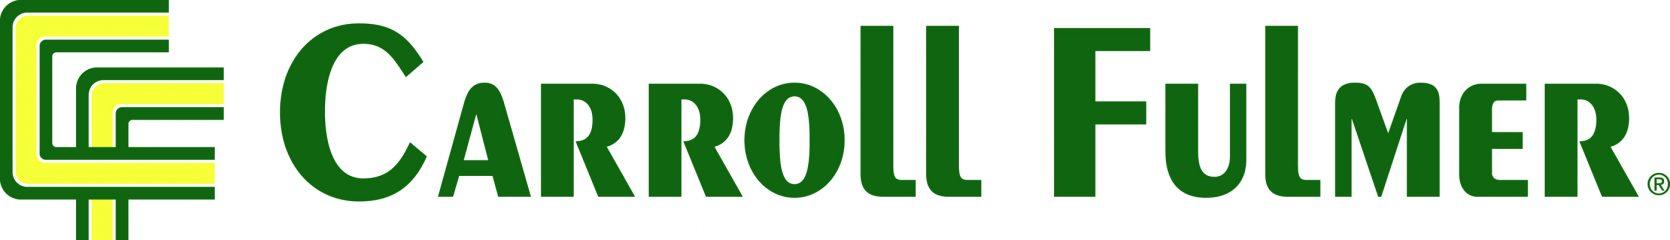 carroll fulmer logistics corporation